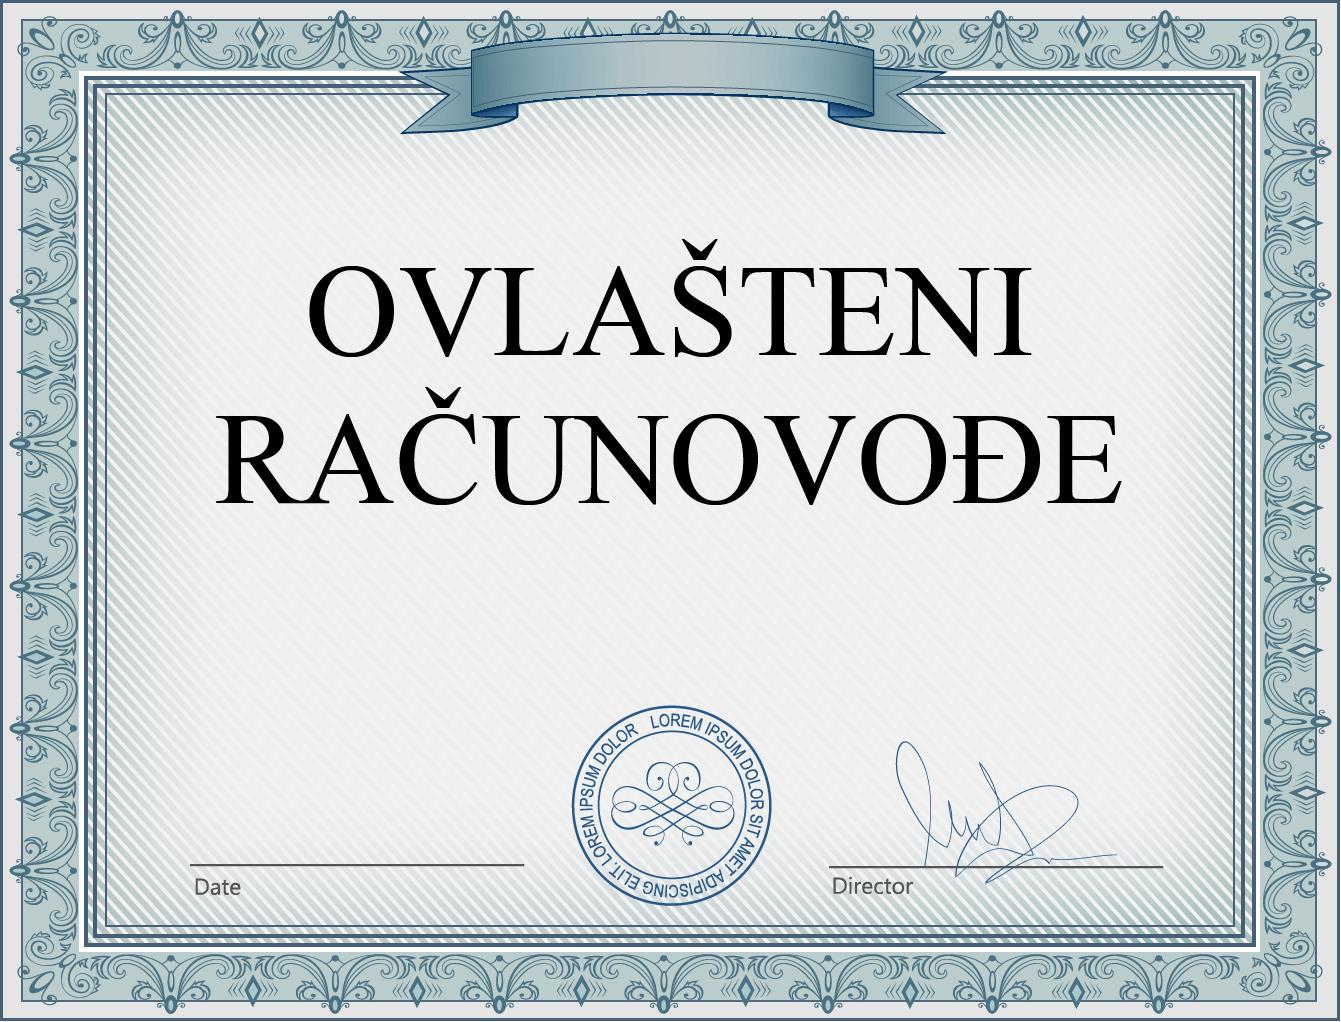 Ovlasteni-RACUNOVODE